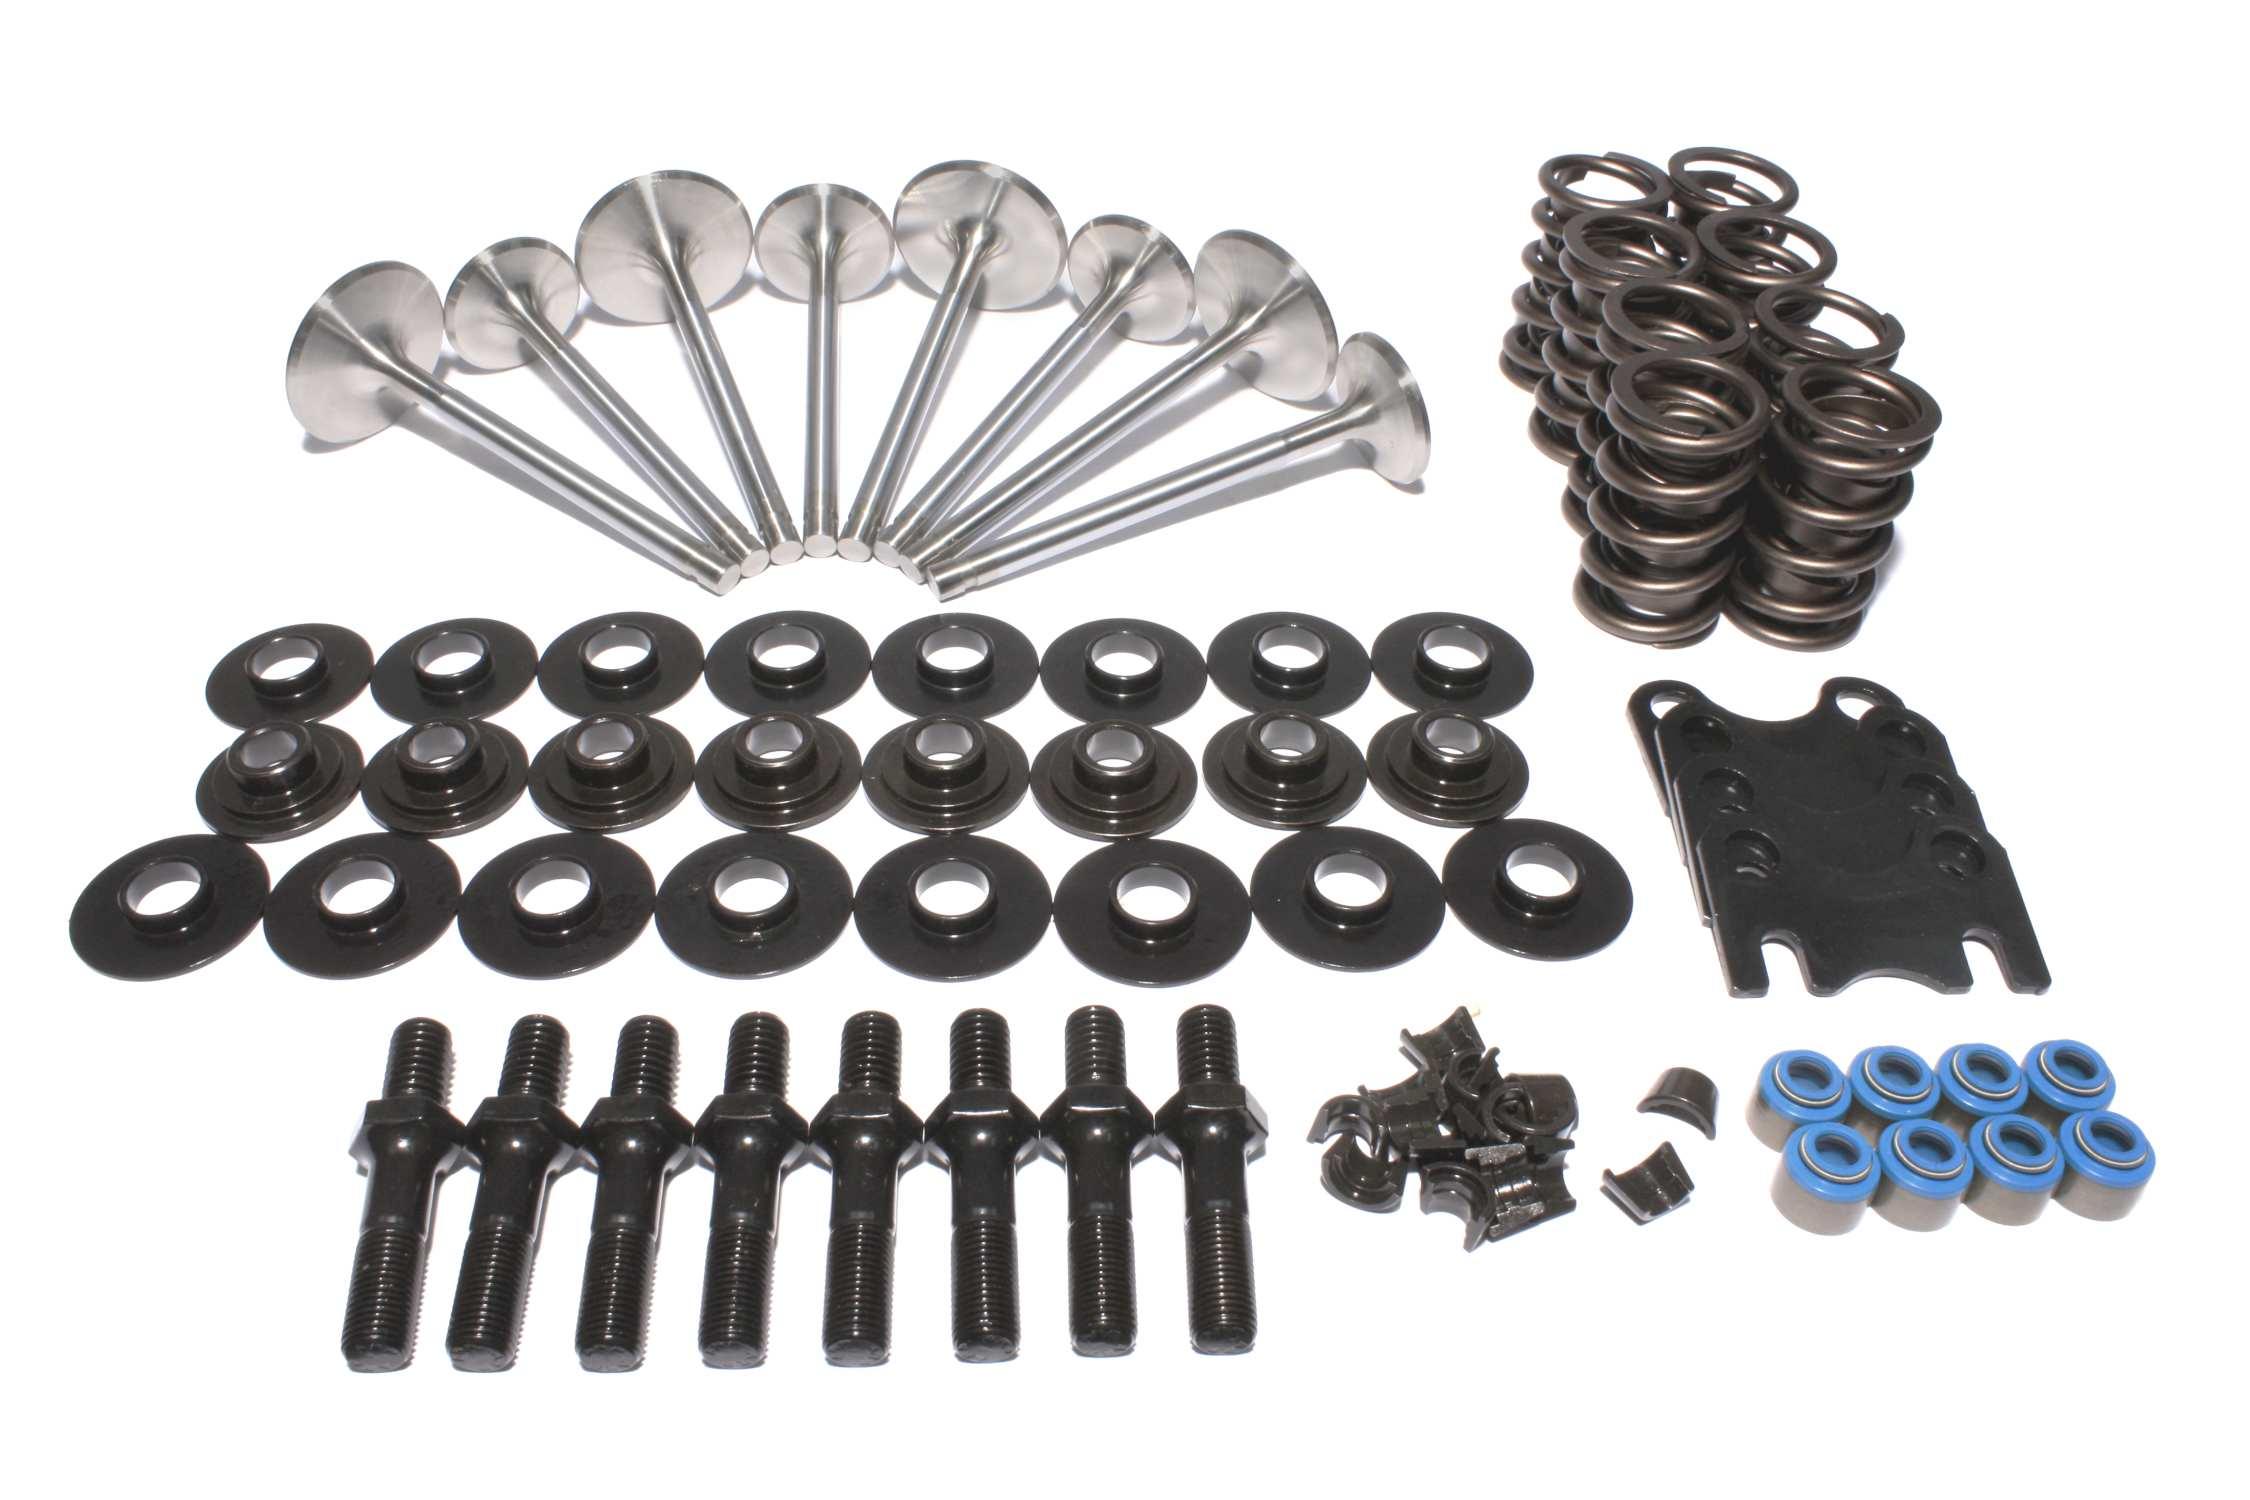 Racing Head Service 01 Rhs Cylinder Head Parts Kits